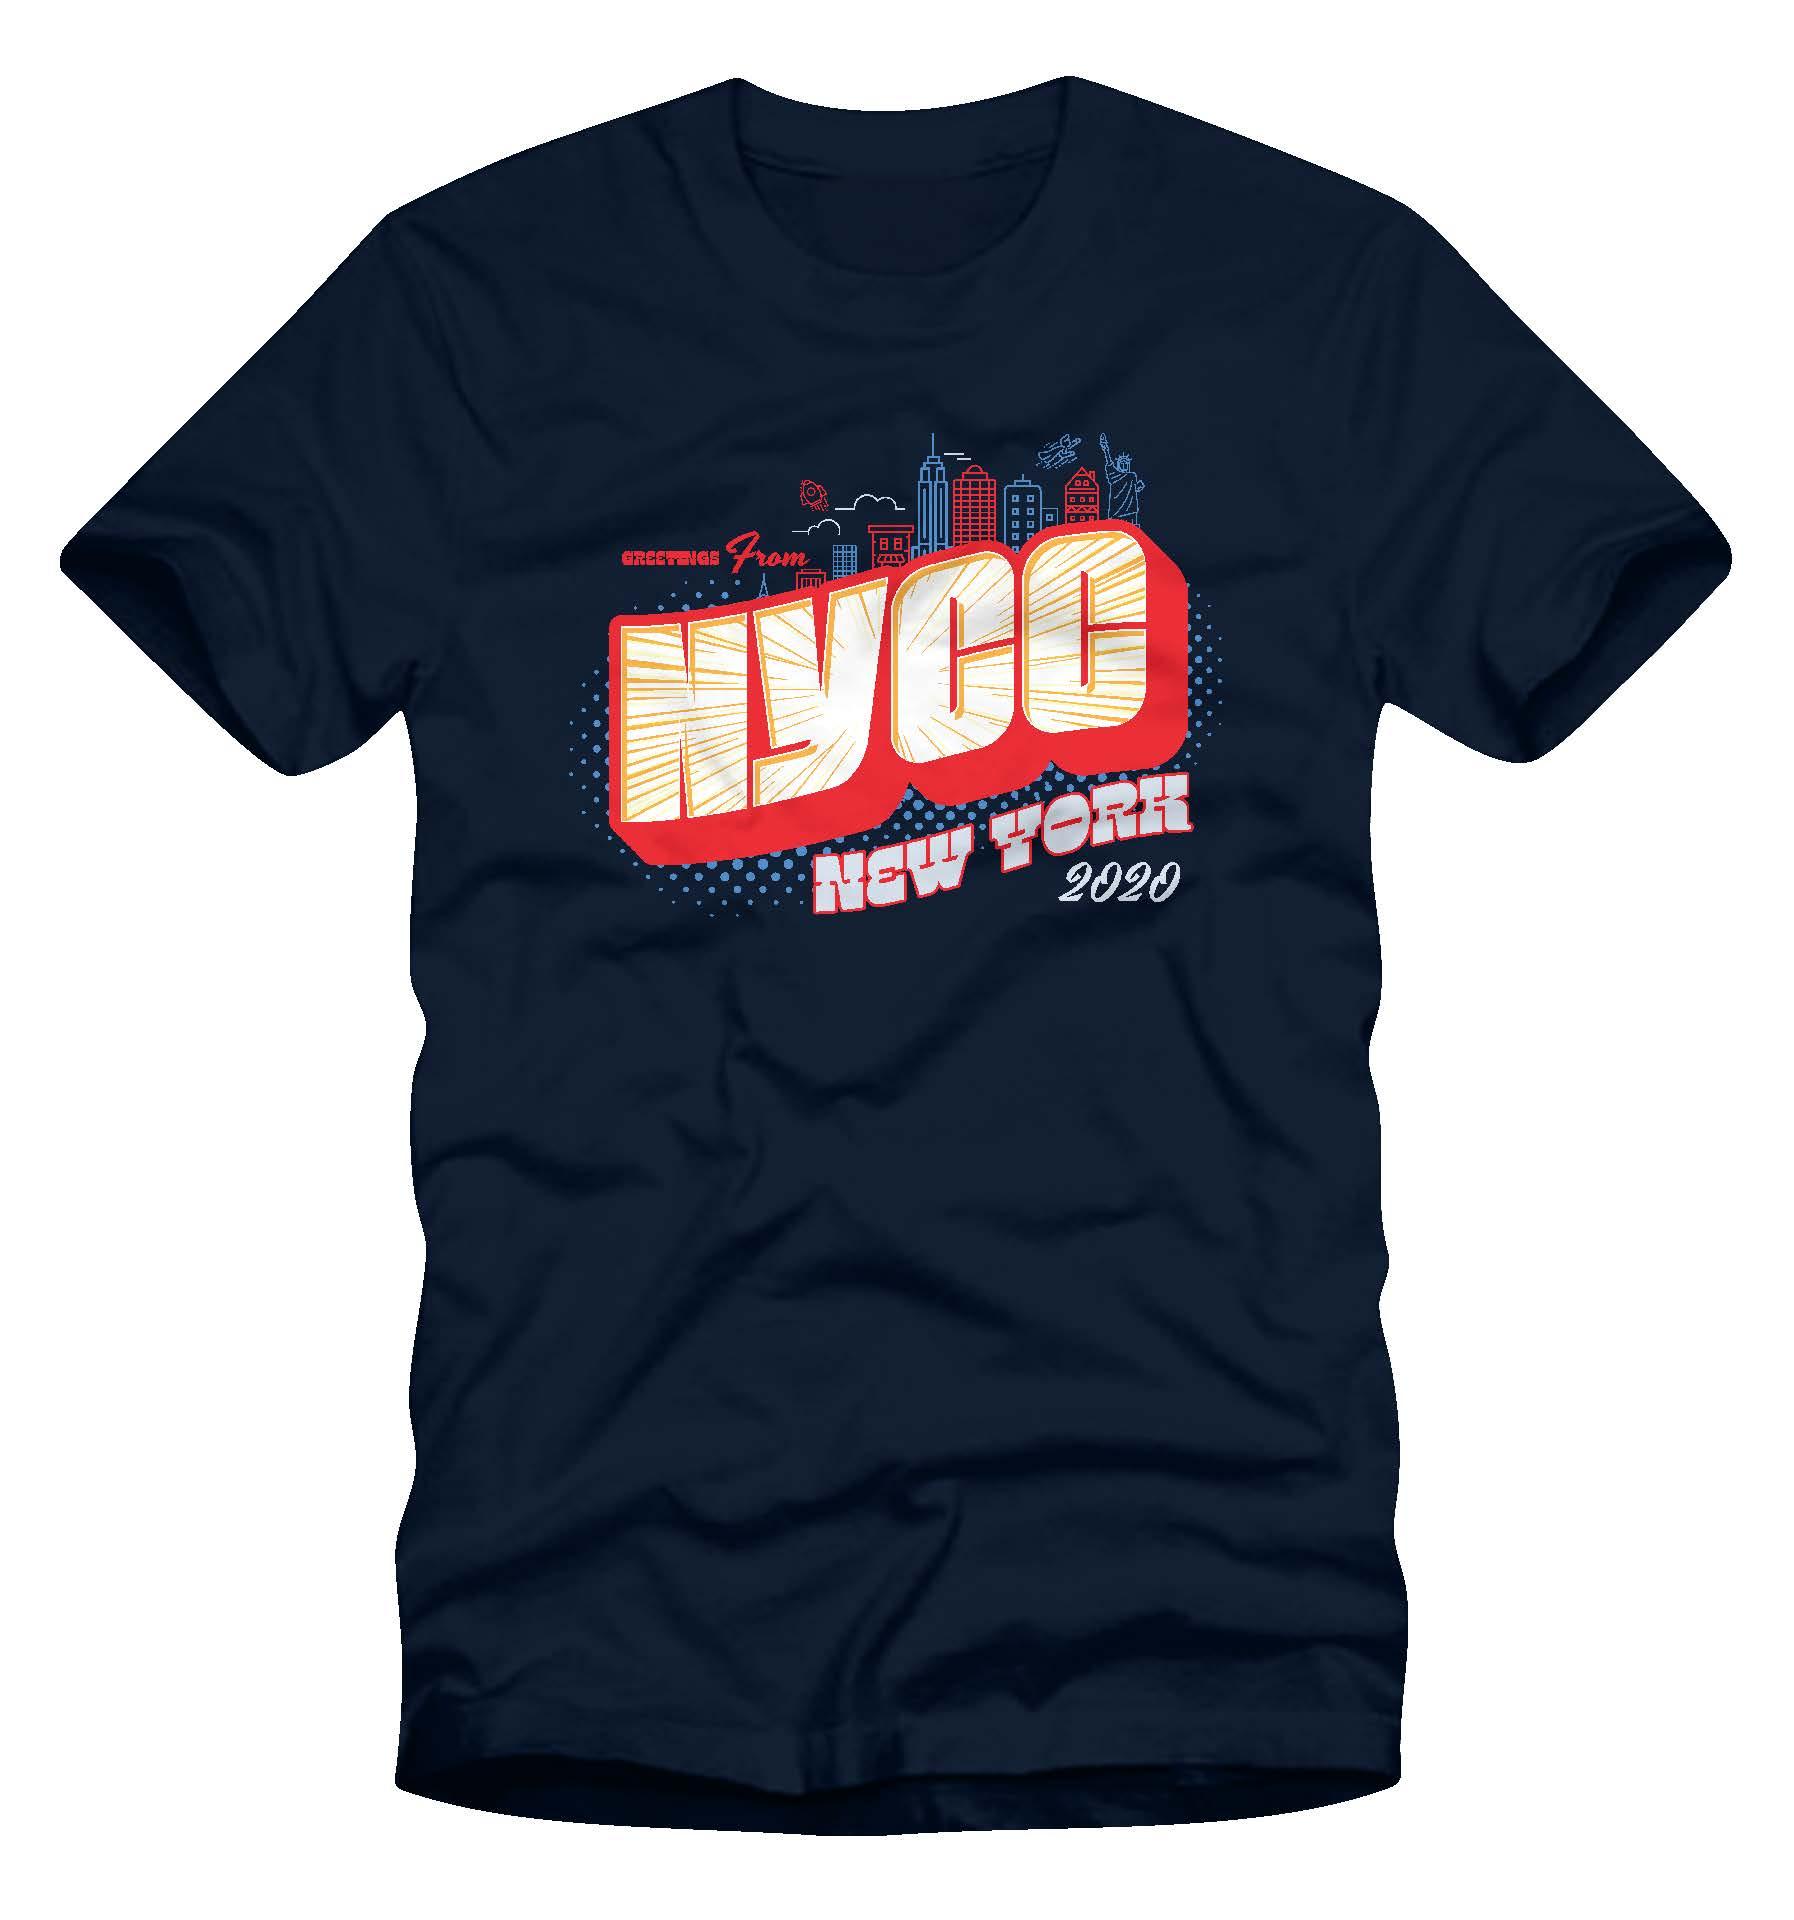 NYCC_GreetingsFrom.jpg